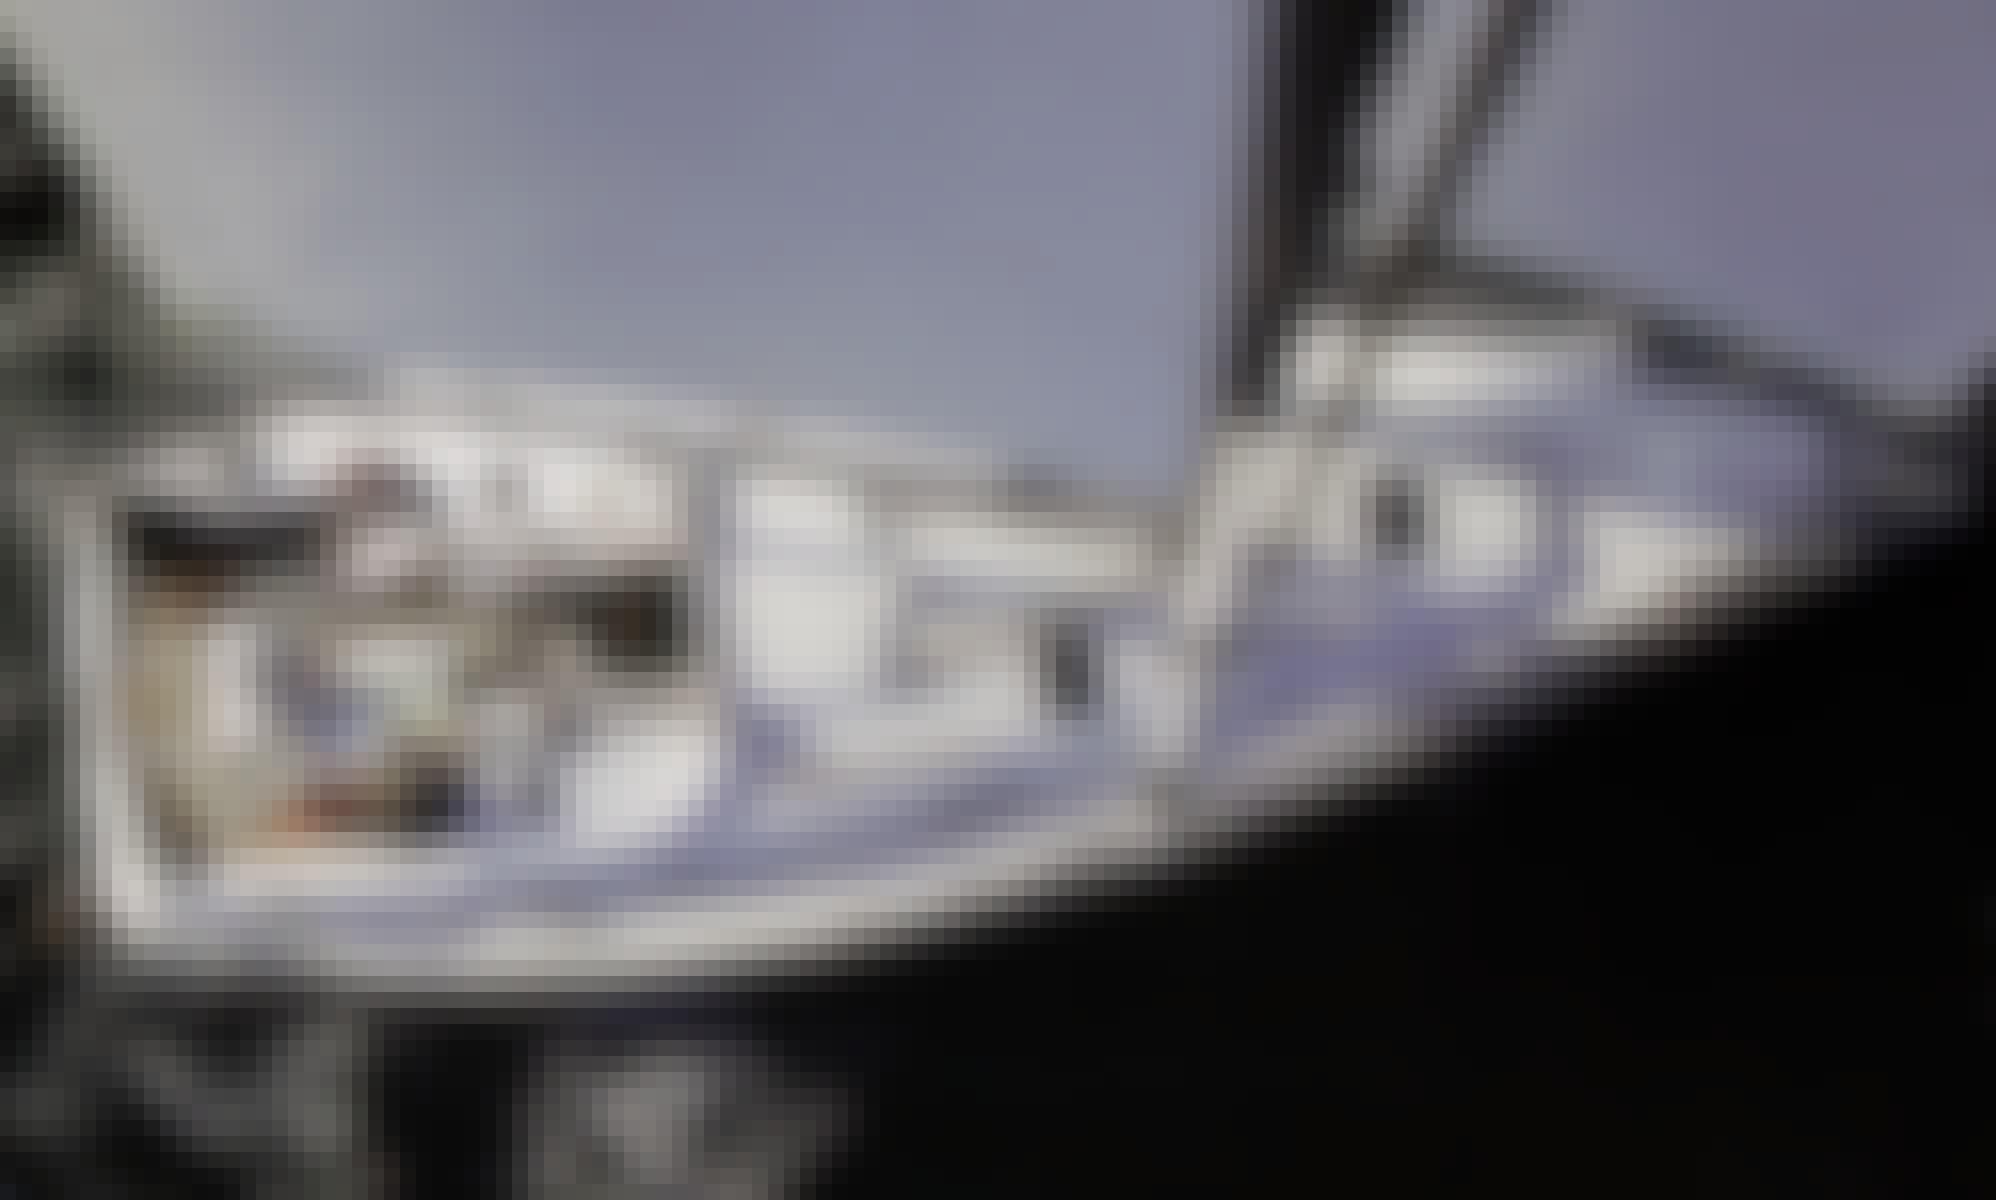 38 feet Beneteau Sailing Yacht Rental in Vancouver, British Columbia